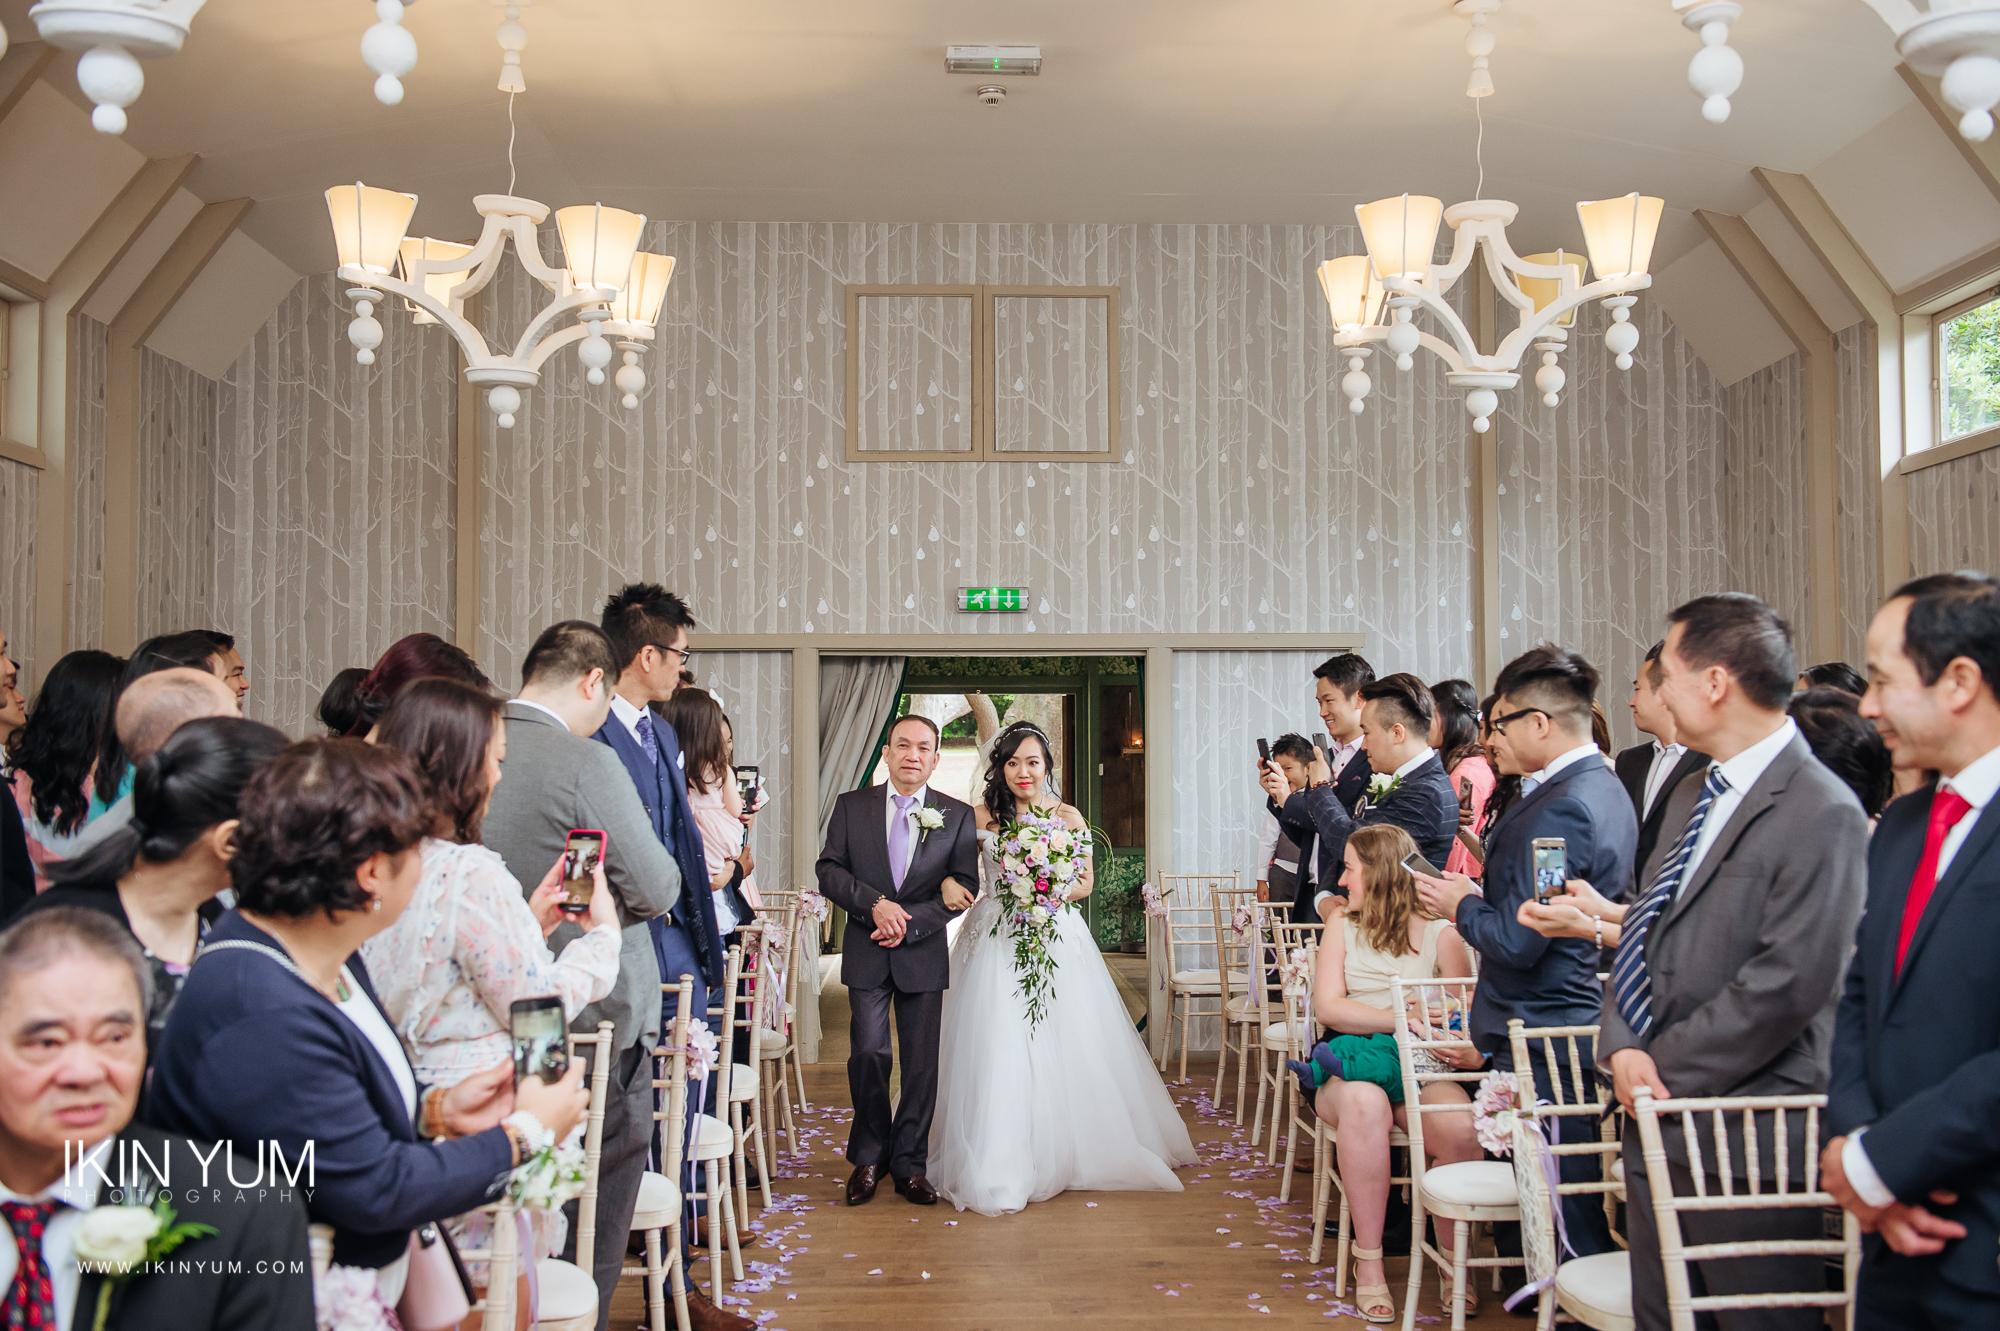 Hampton Manor Wedding - Ikin Yum Photography -071.jpg